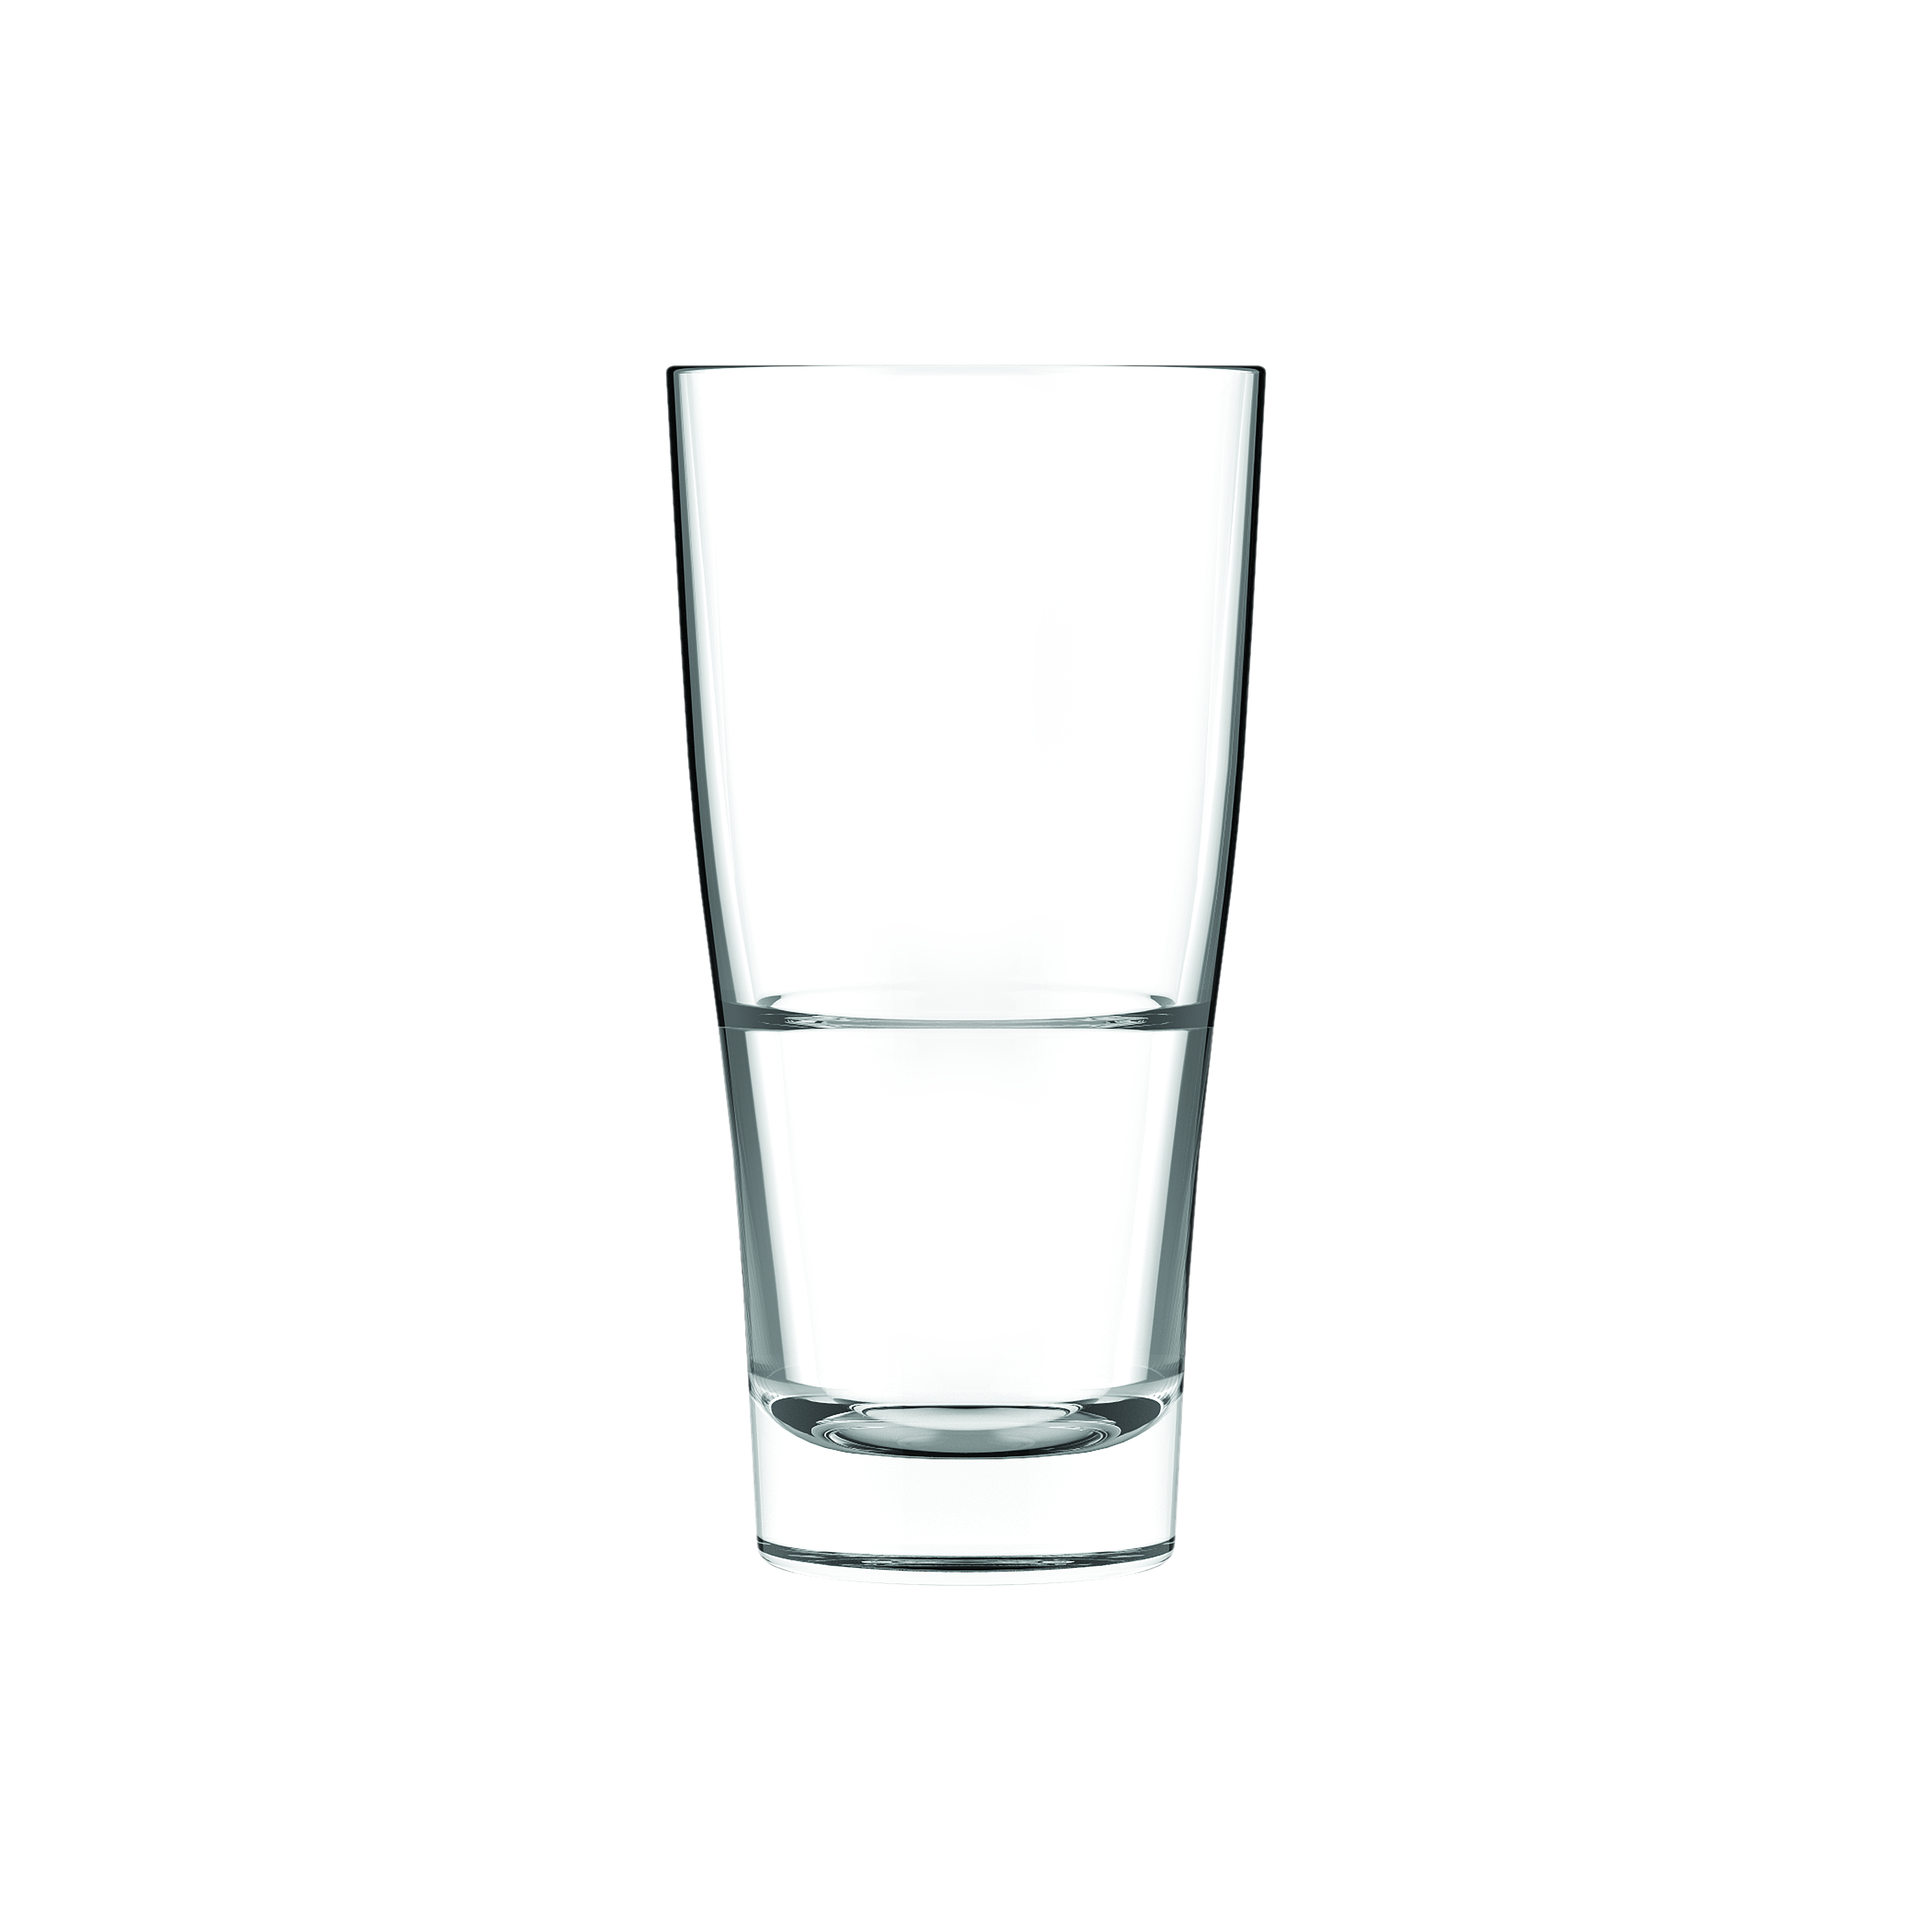 Cardinal N0526 glass, cooler